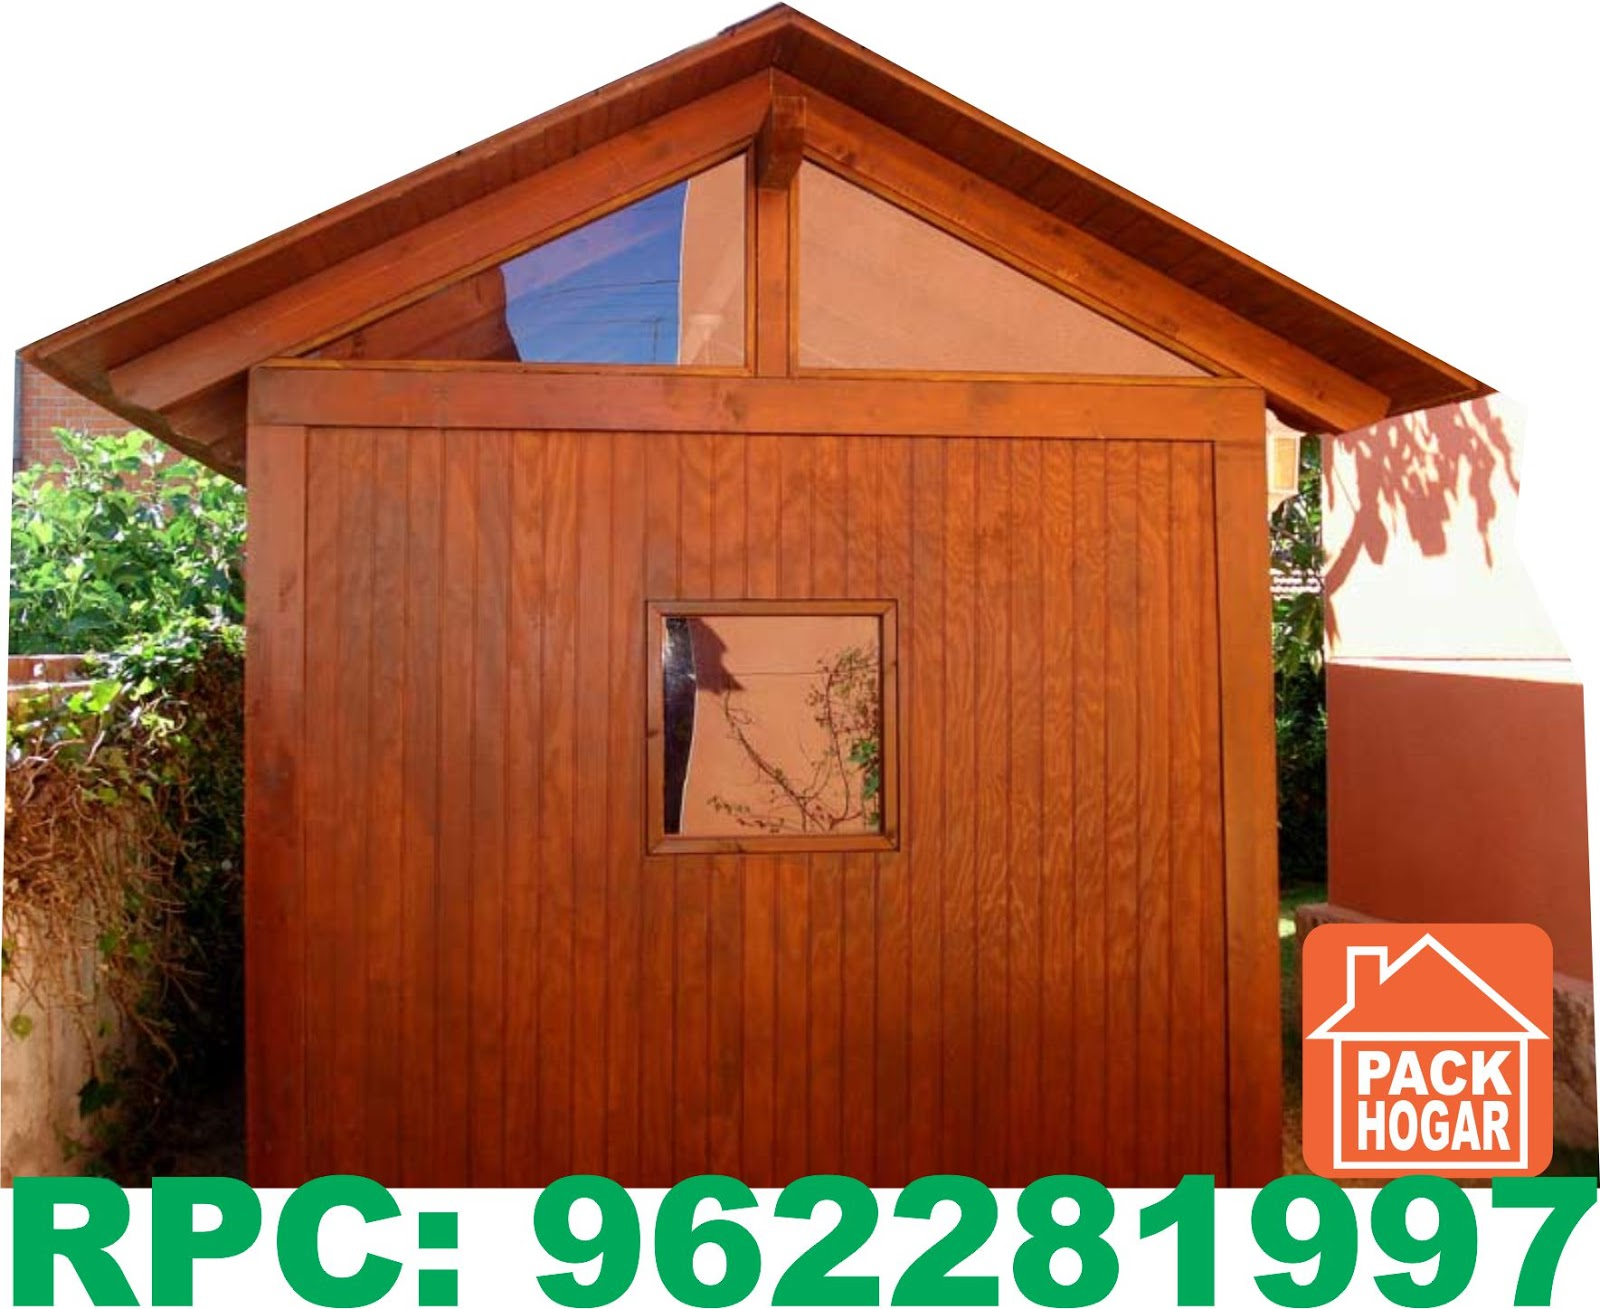 Casetas modulos prefabricadas de madera - Casas prefabricadas modulos ...